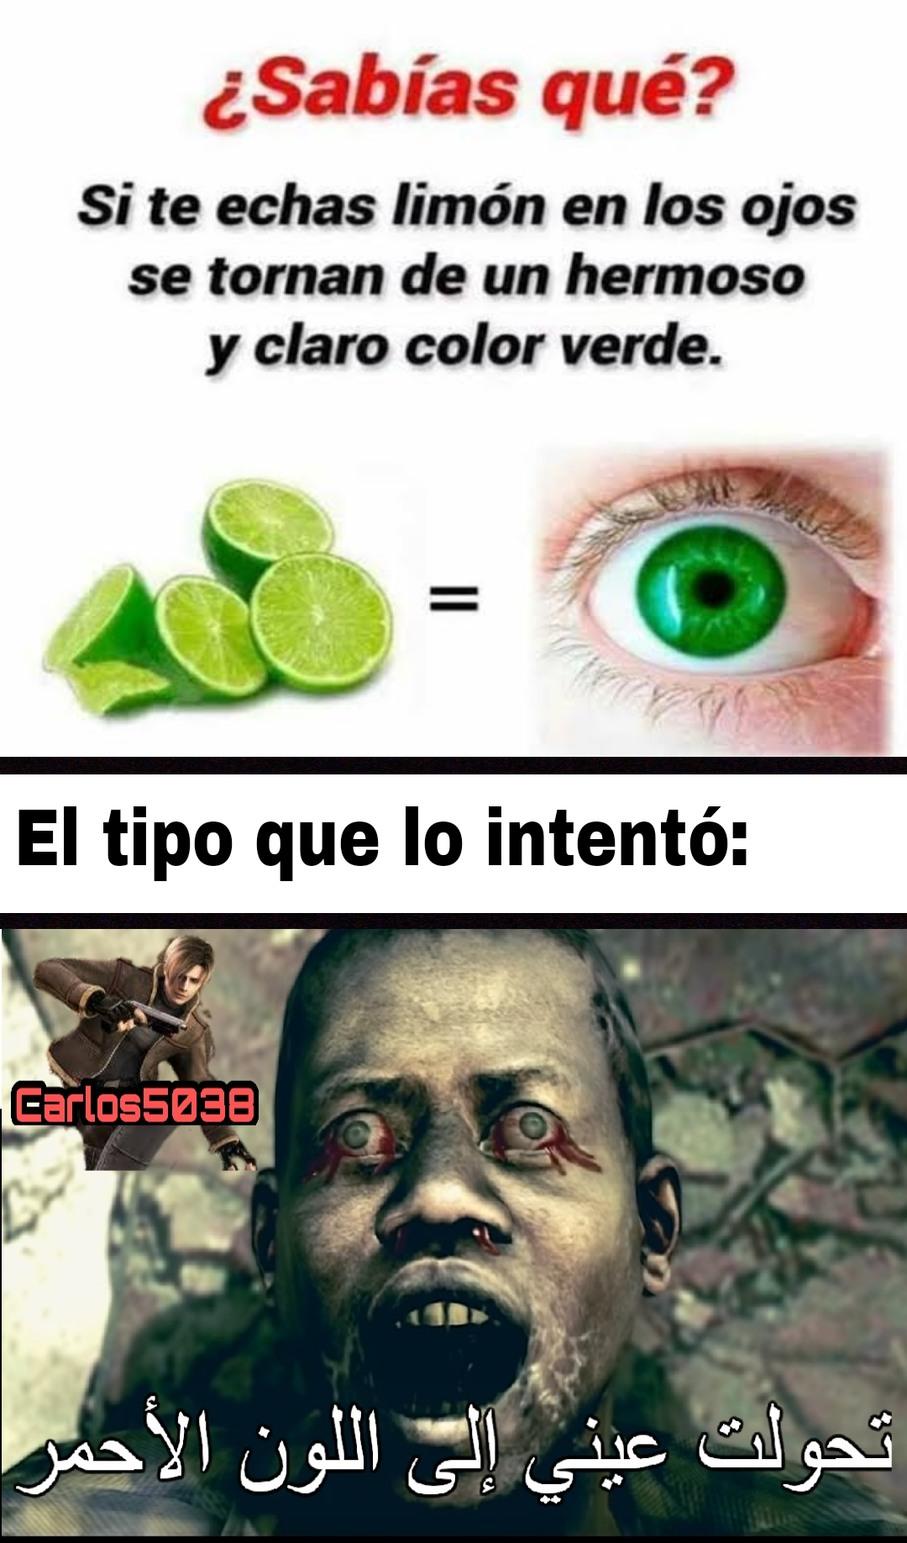 Momento XDDDDD - meme